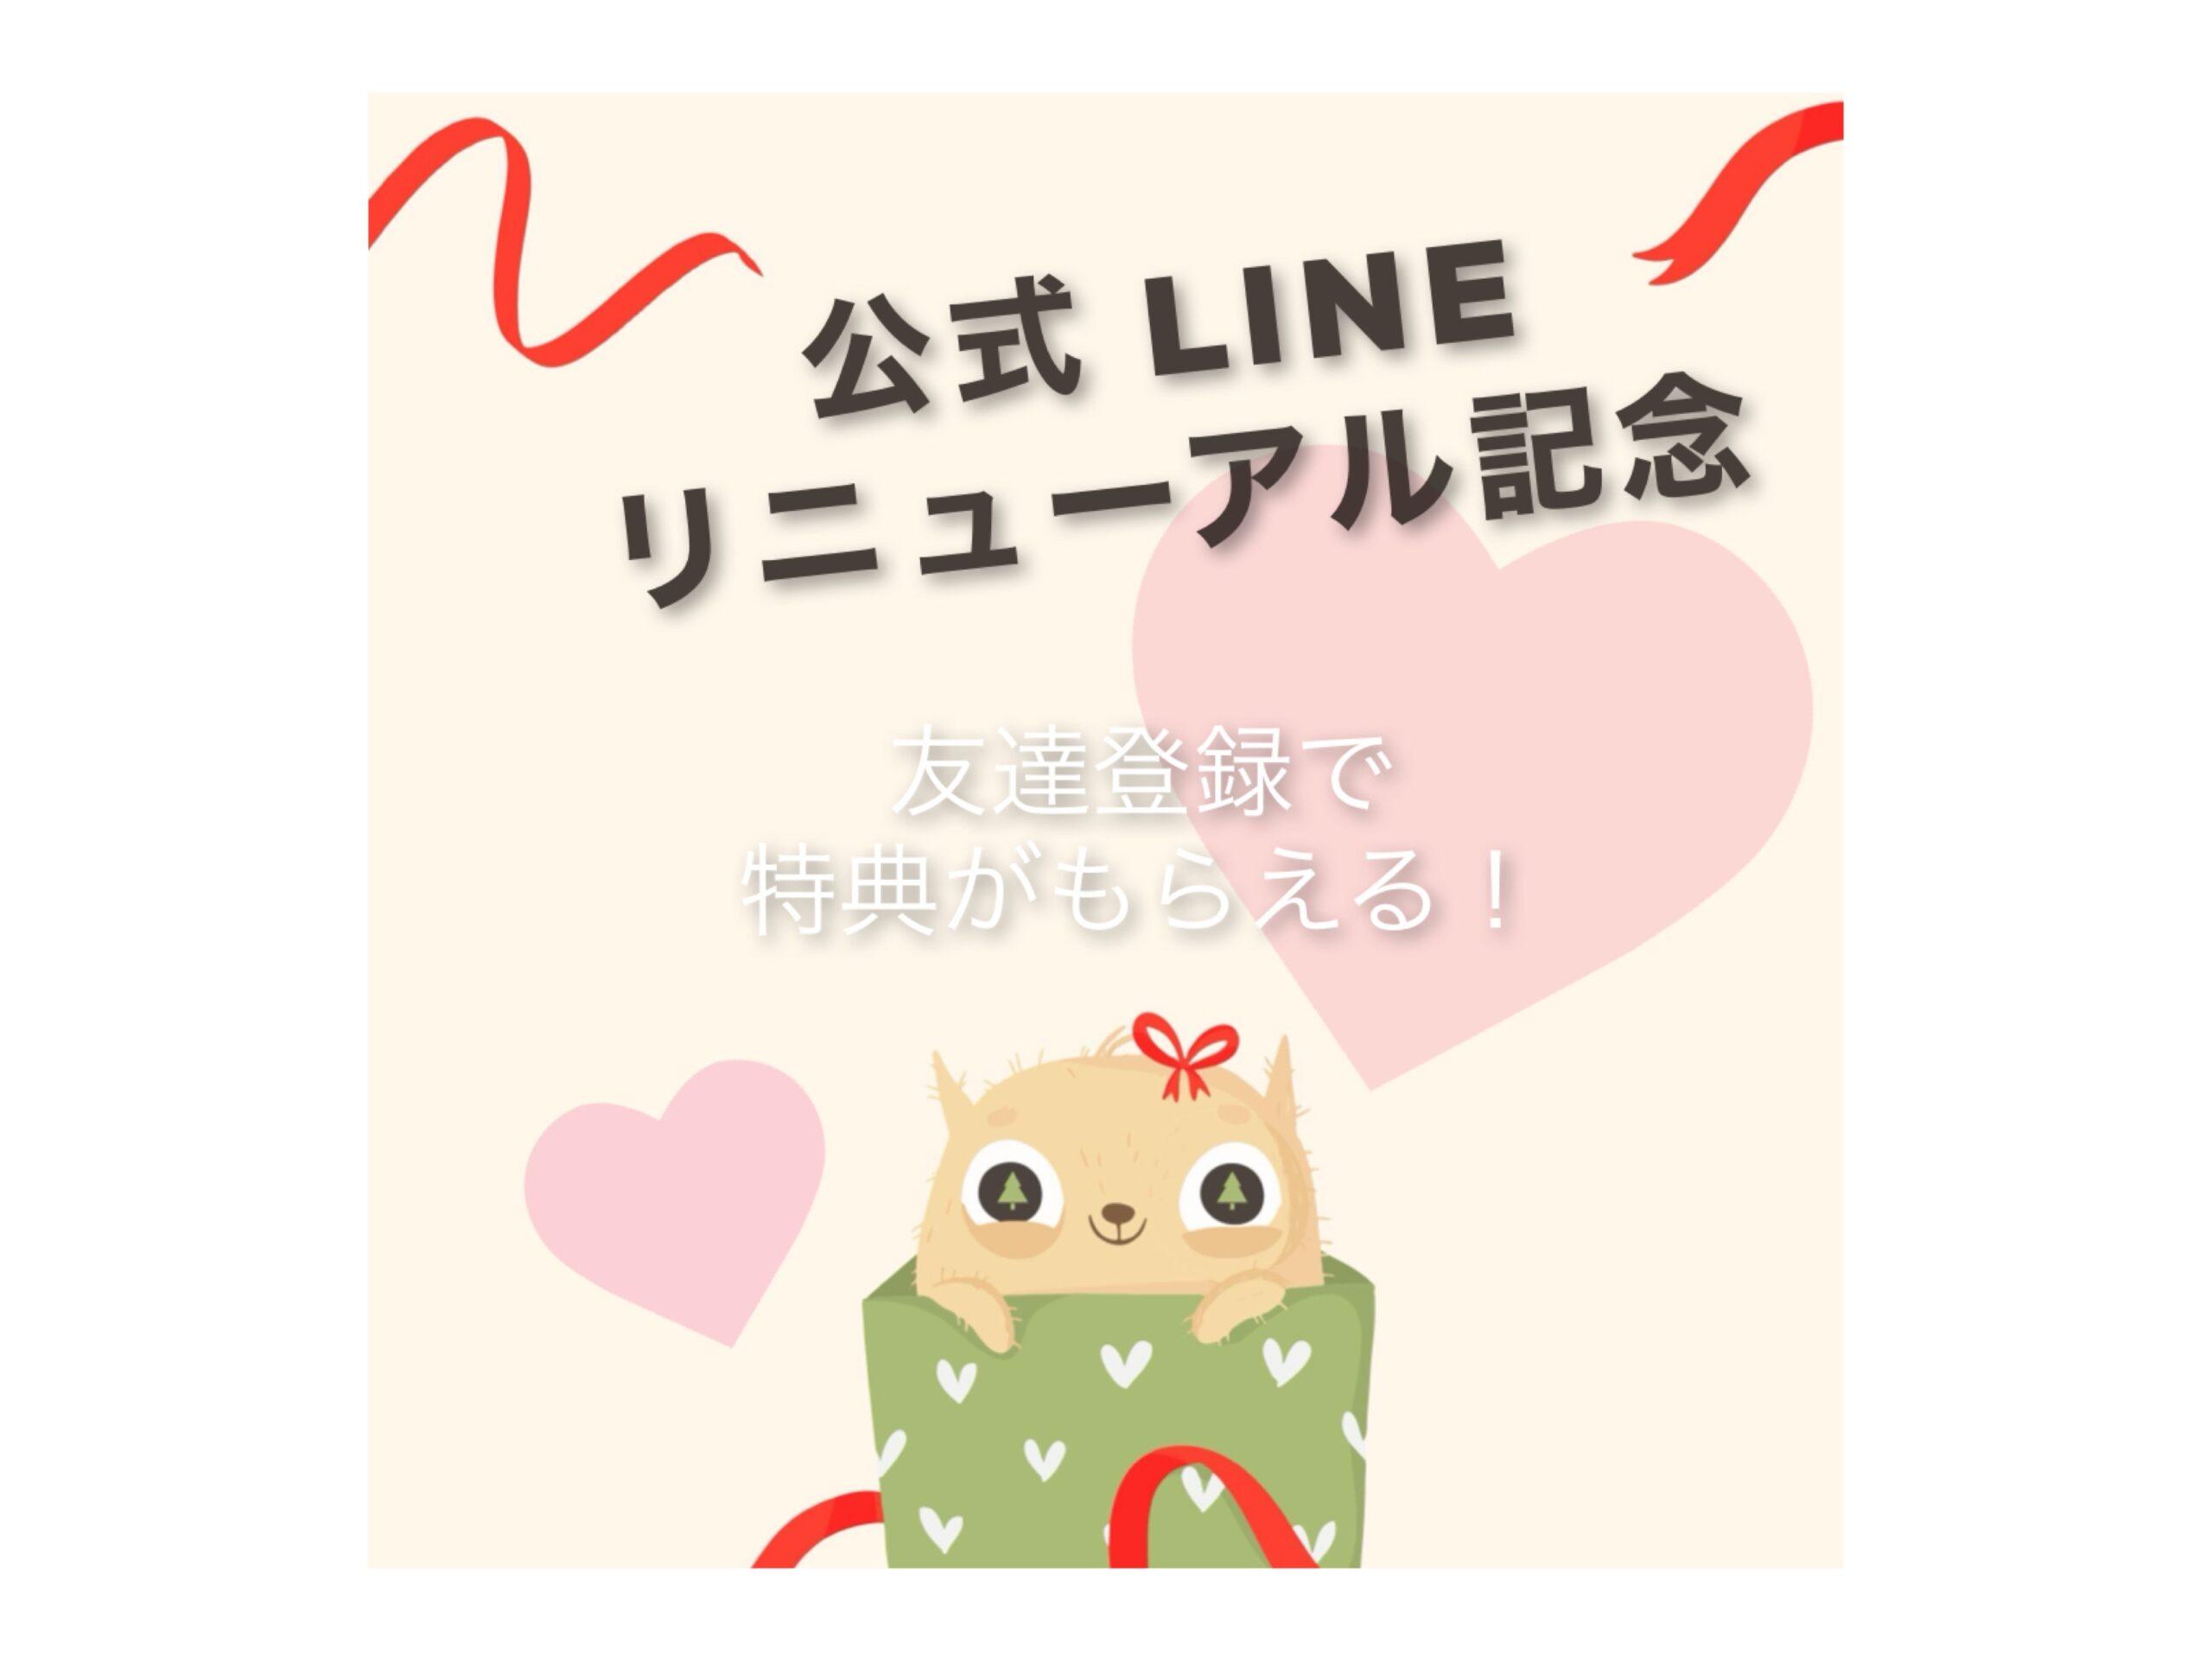 LINE友達募集中♡特典あり♡